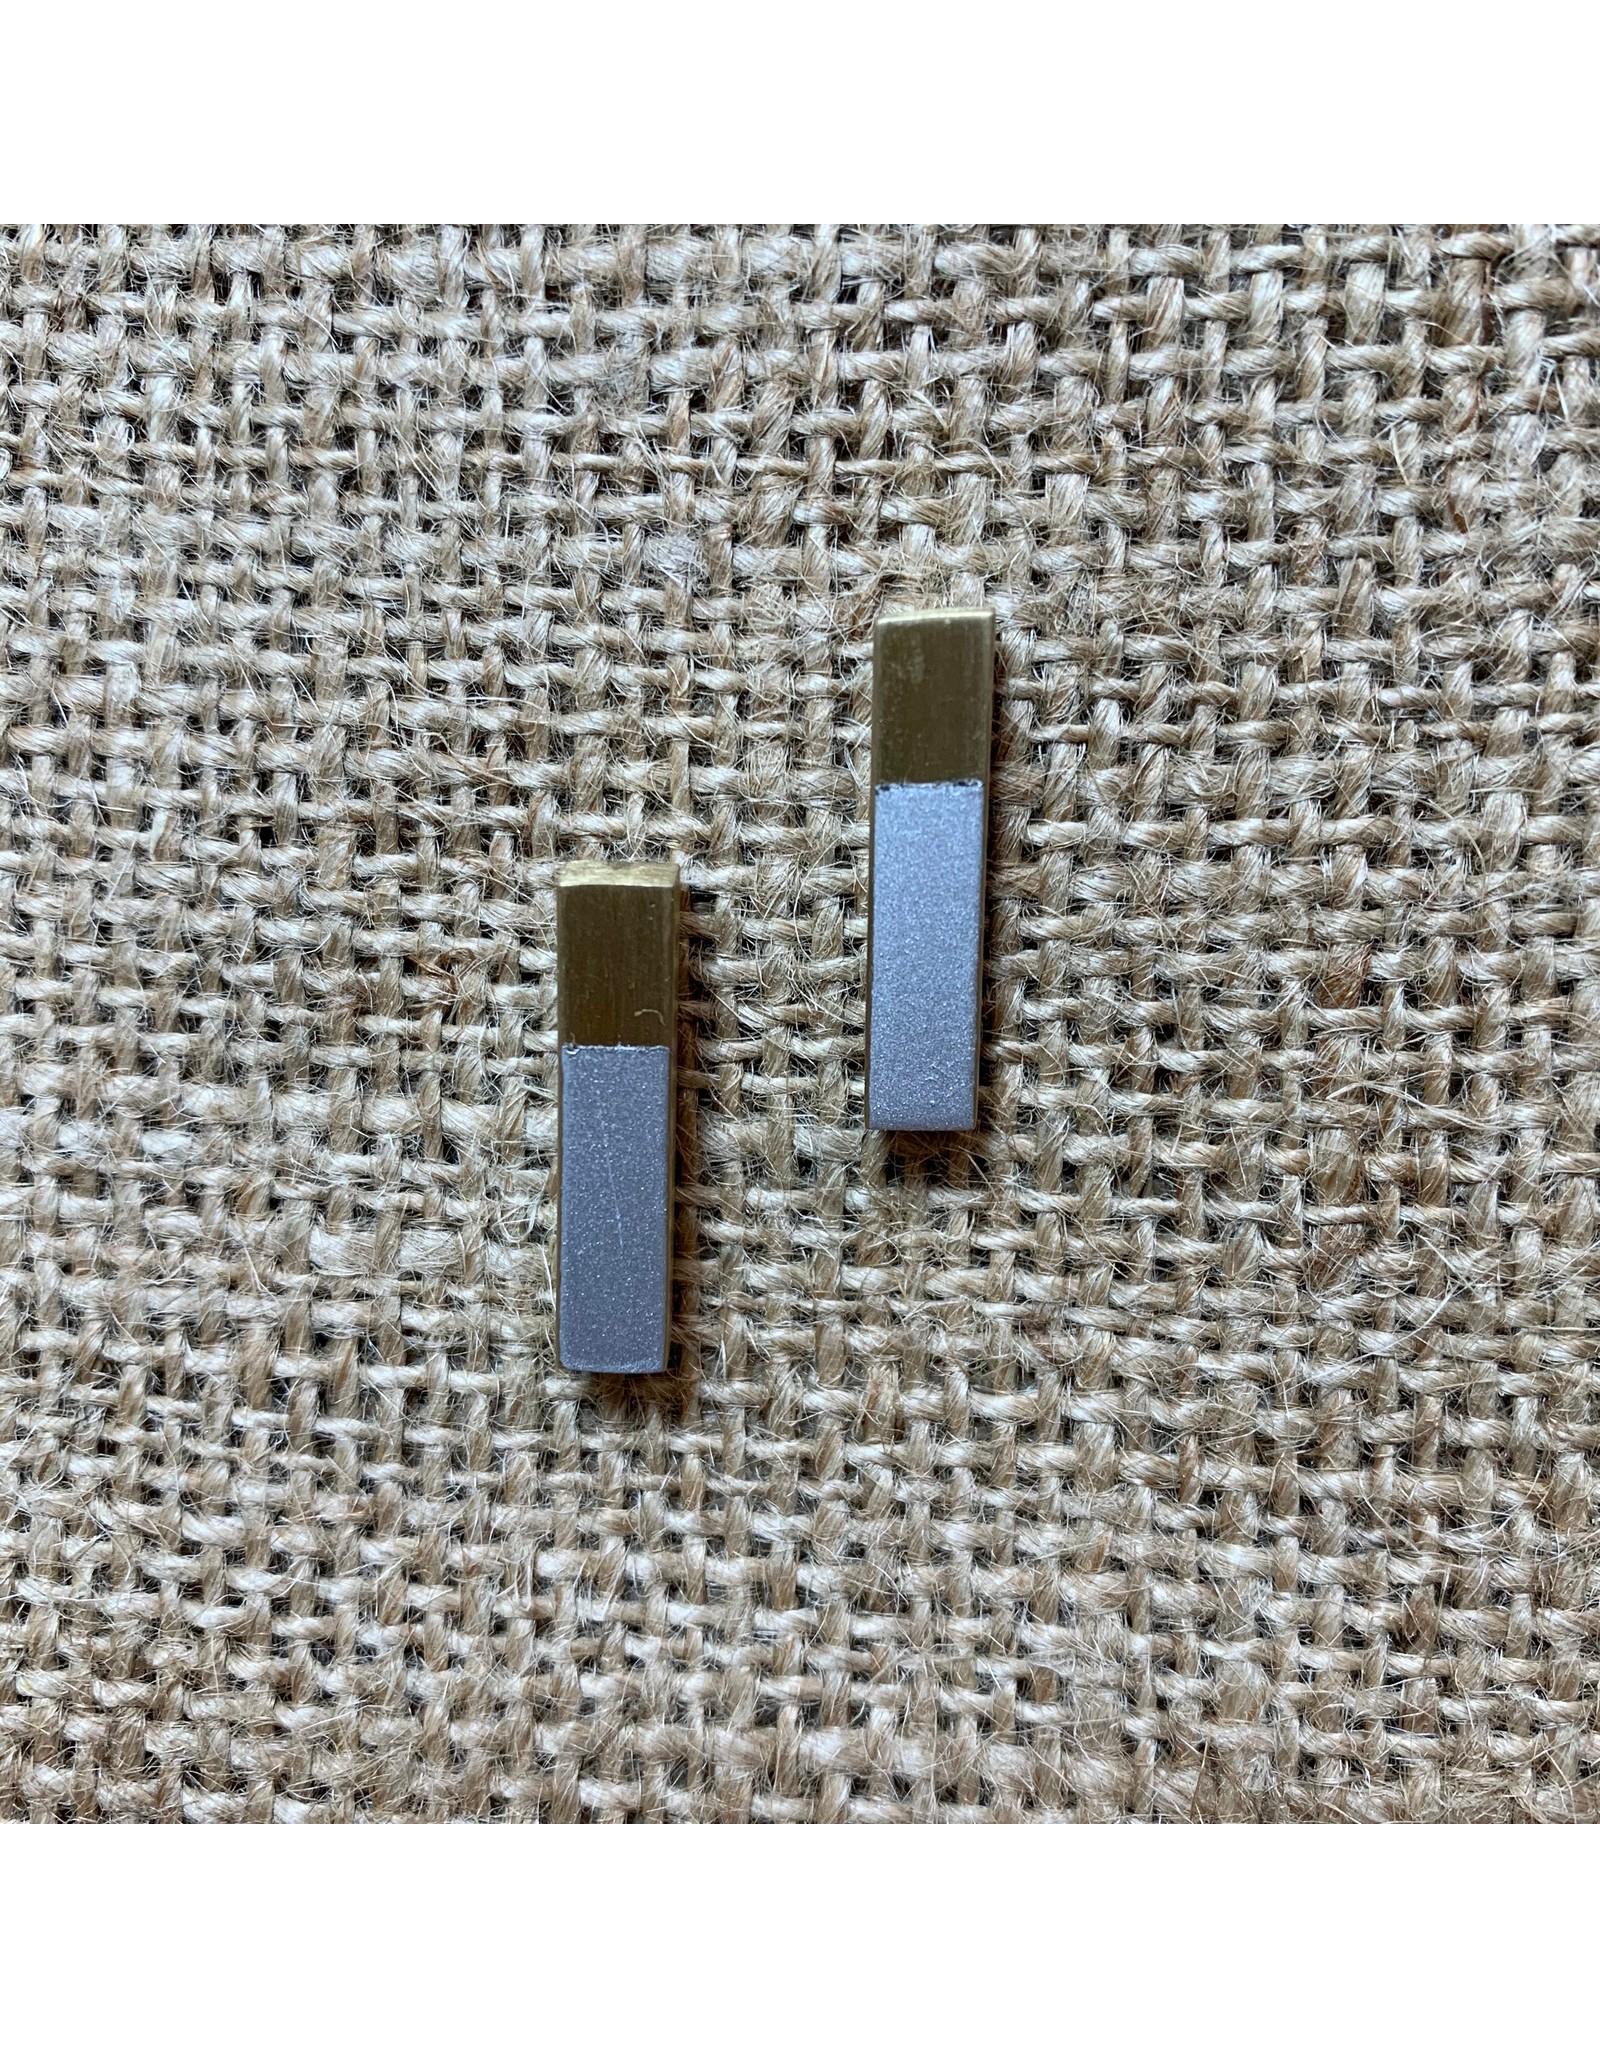 Earrings Two Tone Studs, India